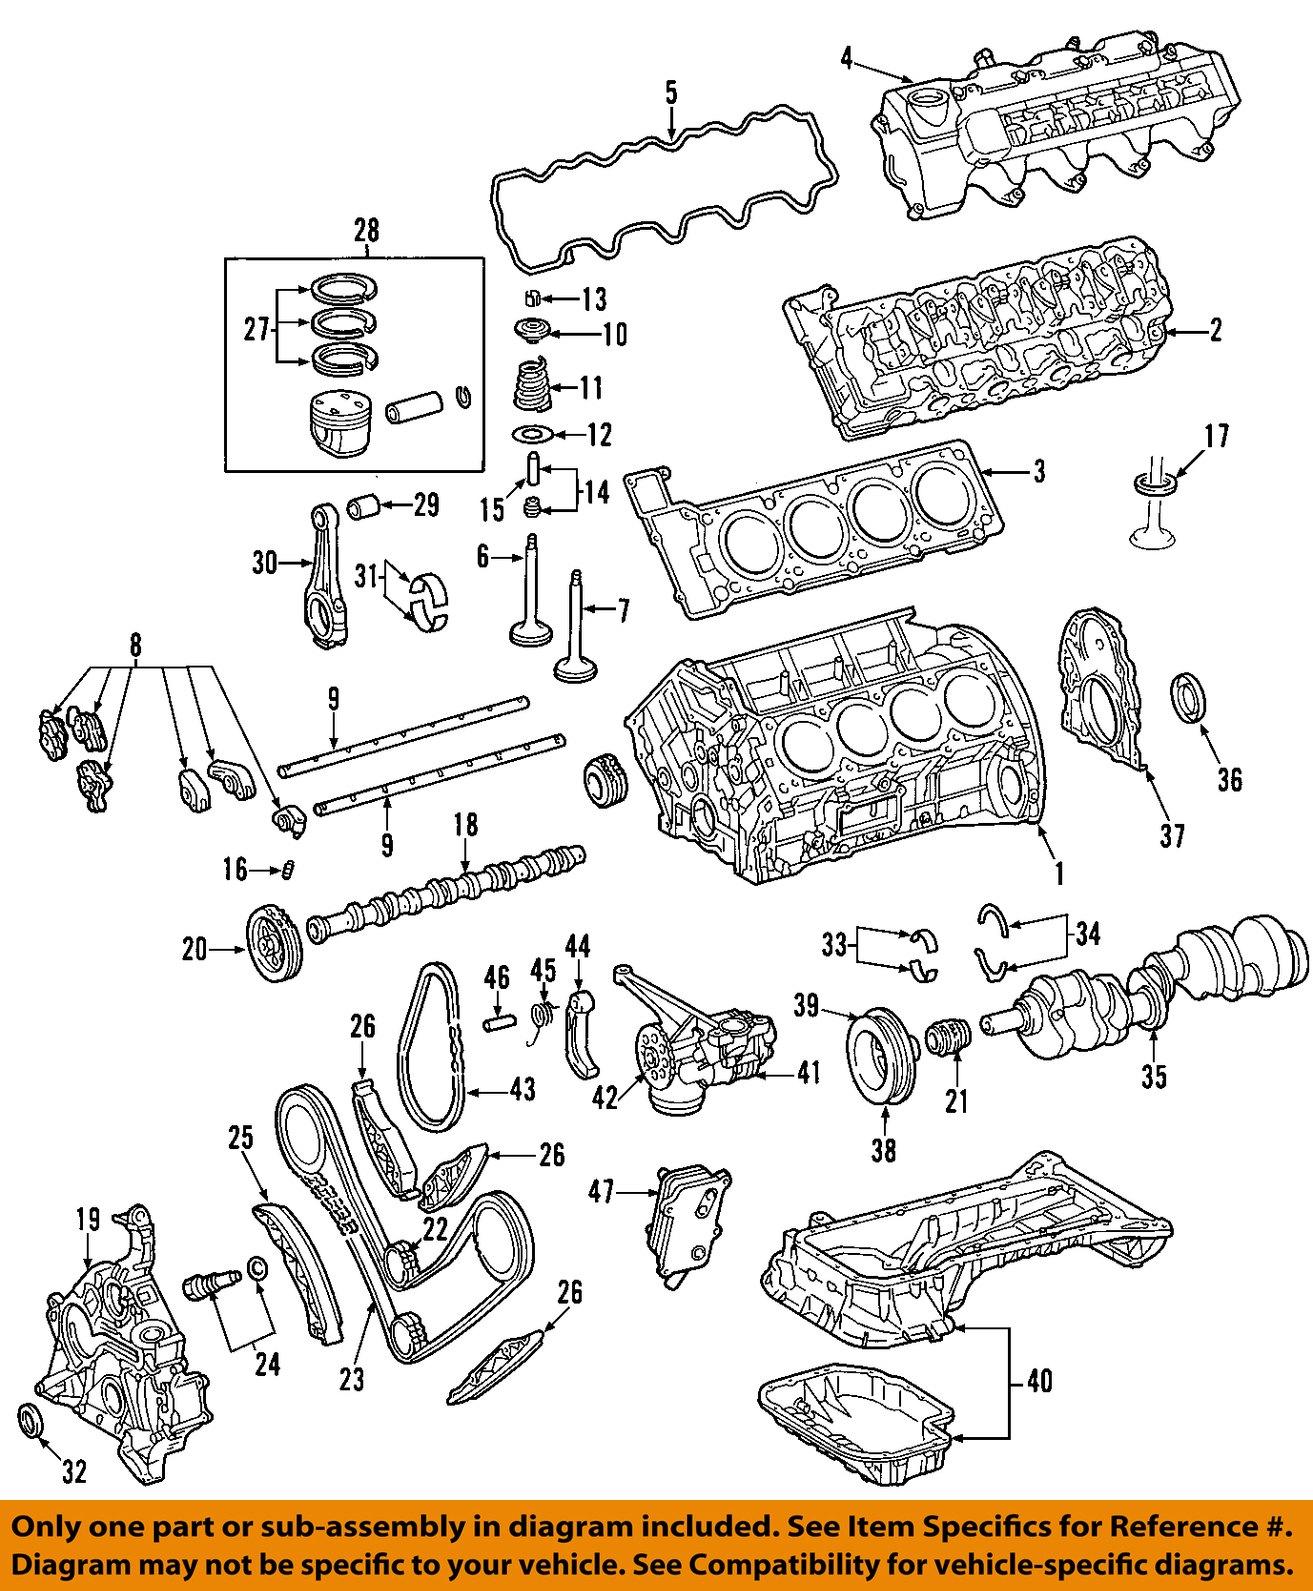 mercedes oem 00 06 s500 engine oil pump 1131800101 mercedes oem 00 06 s500 engine oil pump 1131800101